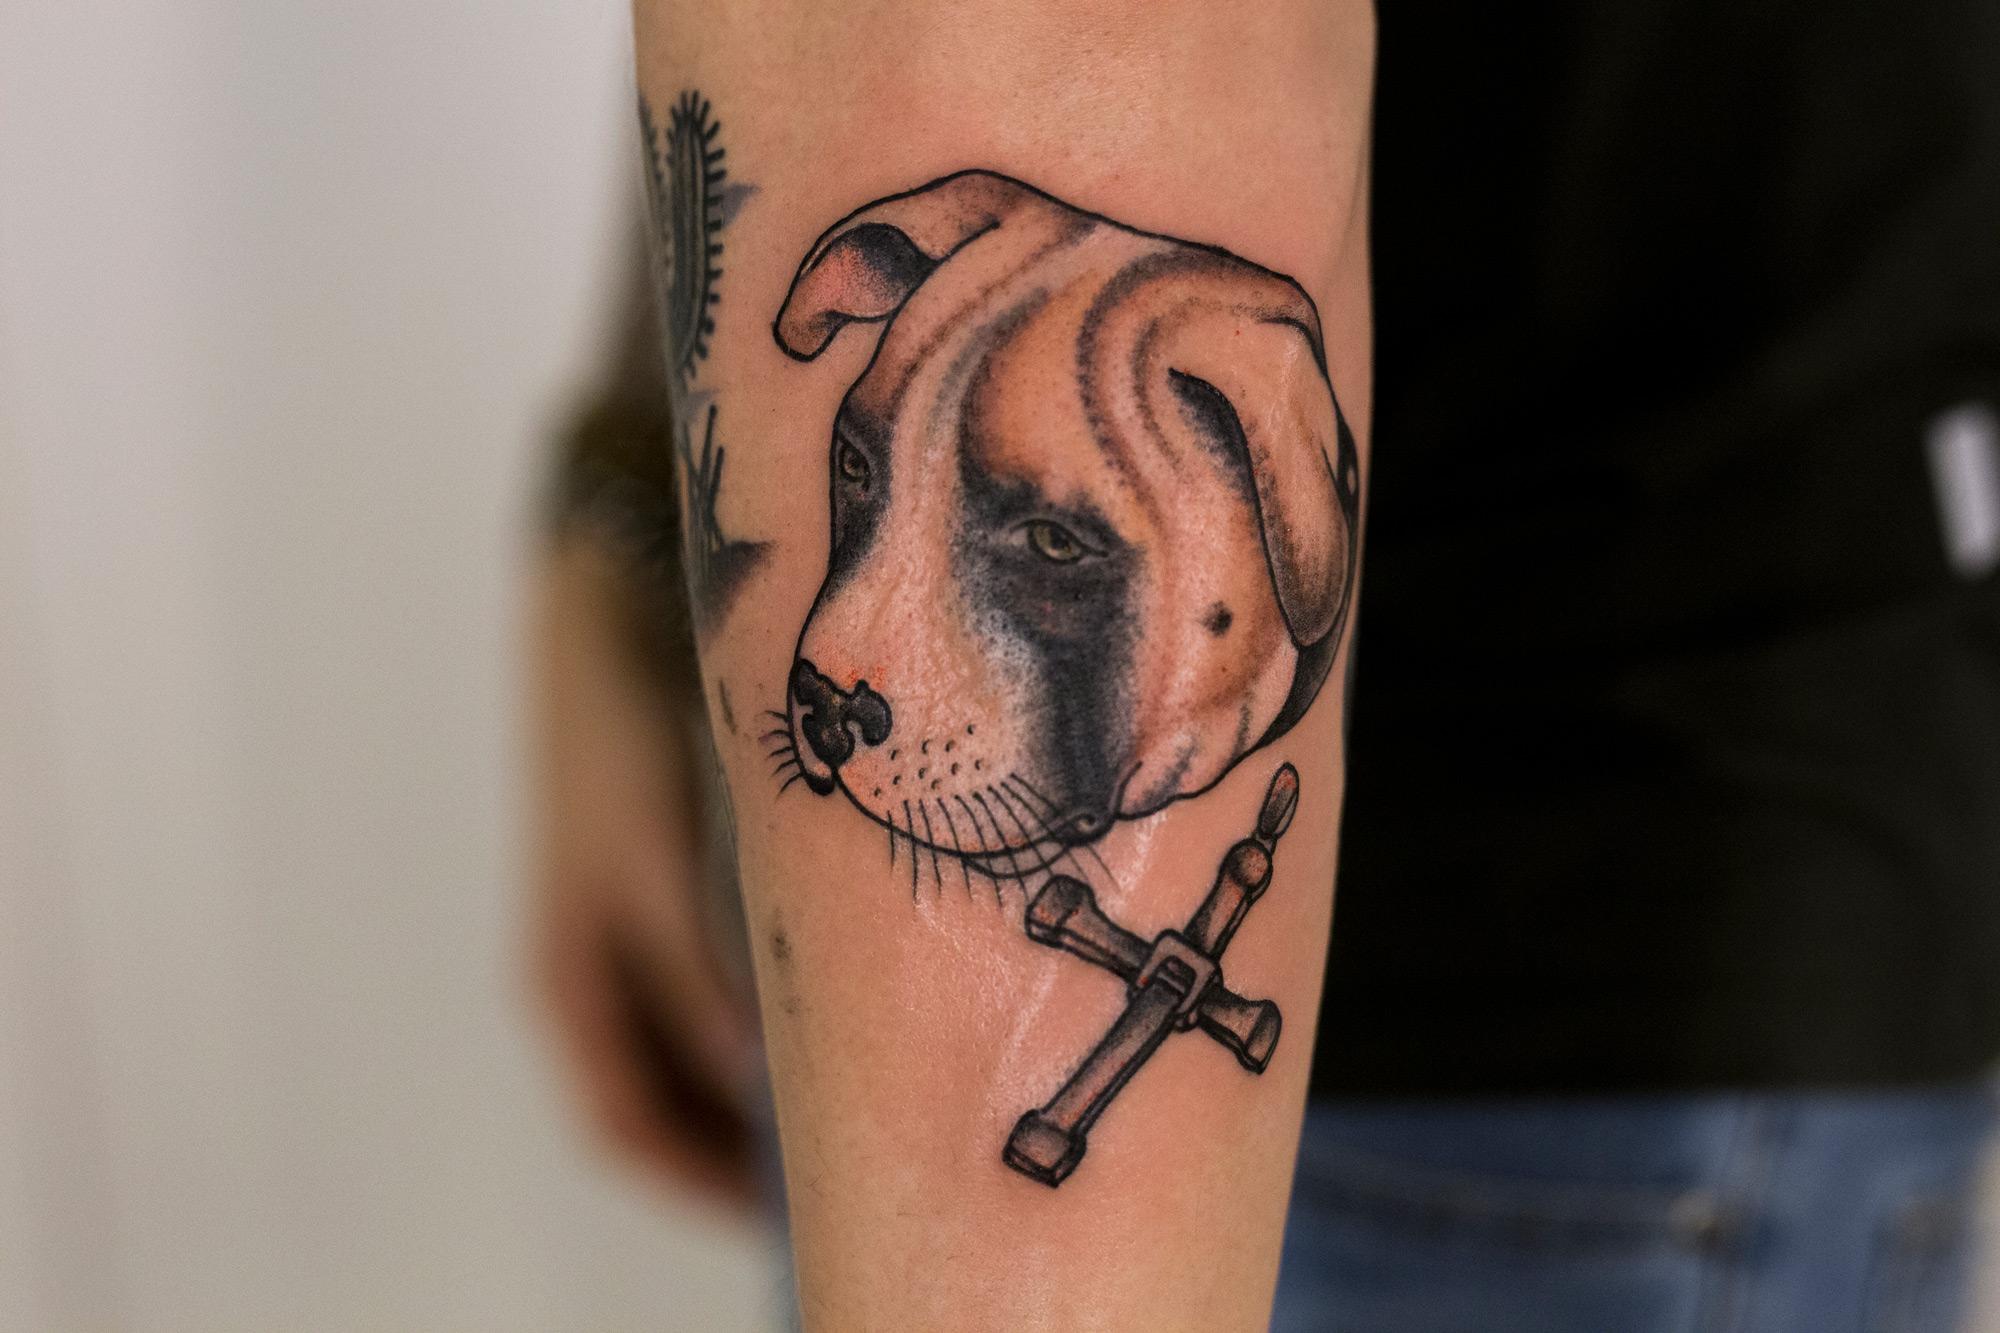 Fabulous Stephan zet tatoeage met luisteraar - Qmusic @OY34